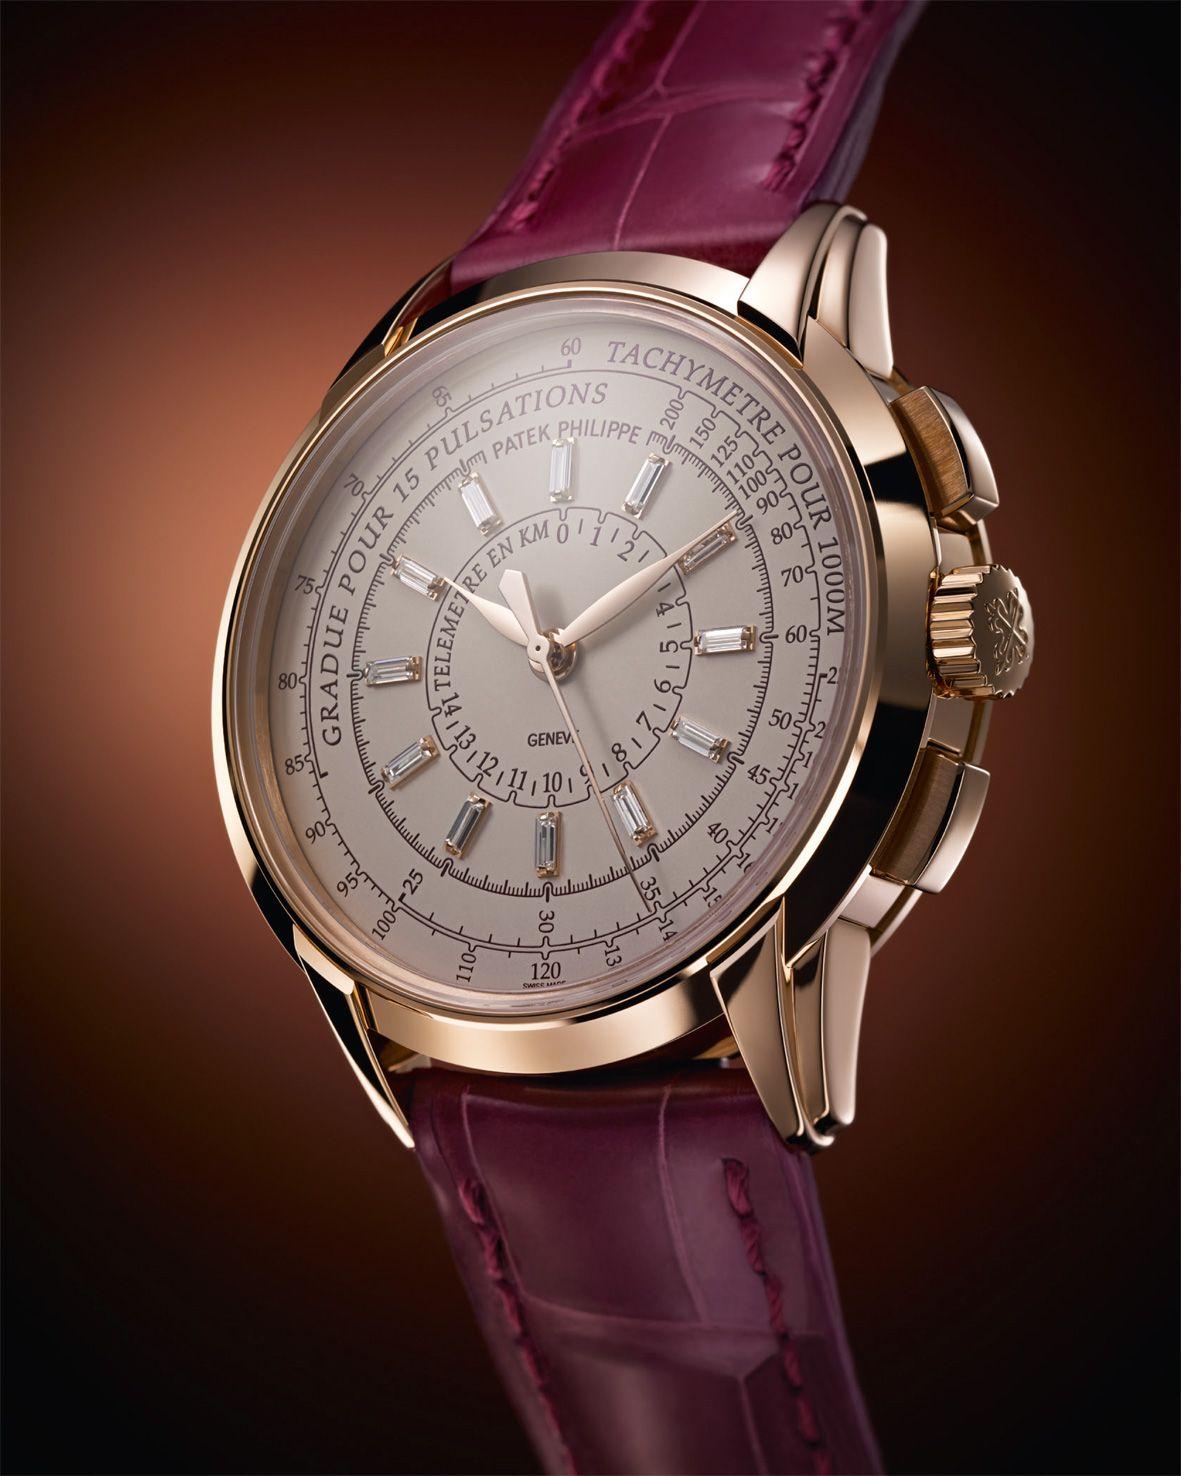 af253bef01e Patek Philippe Multi Scale Chronograph oro y diamantes. Relógios De  LuxoRelógios ...